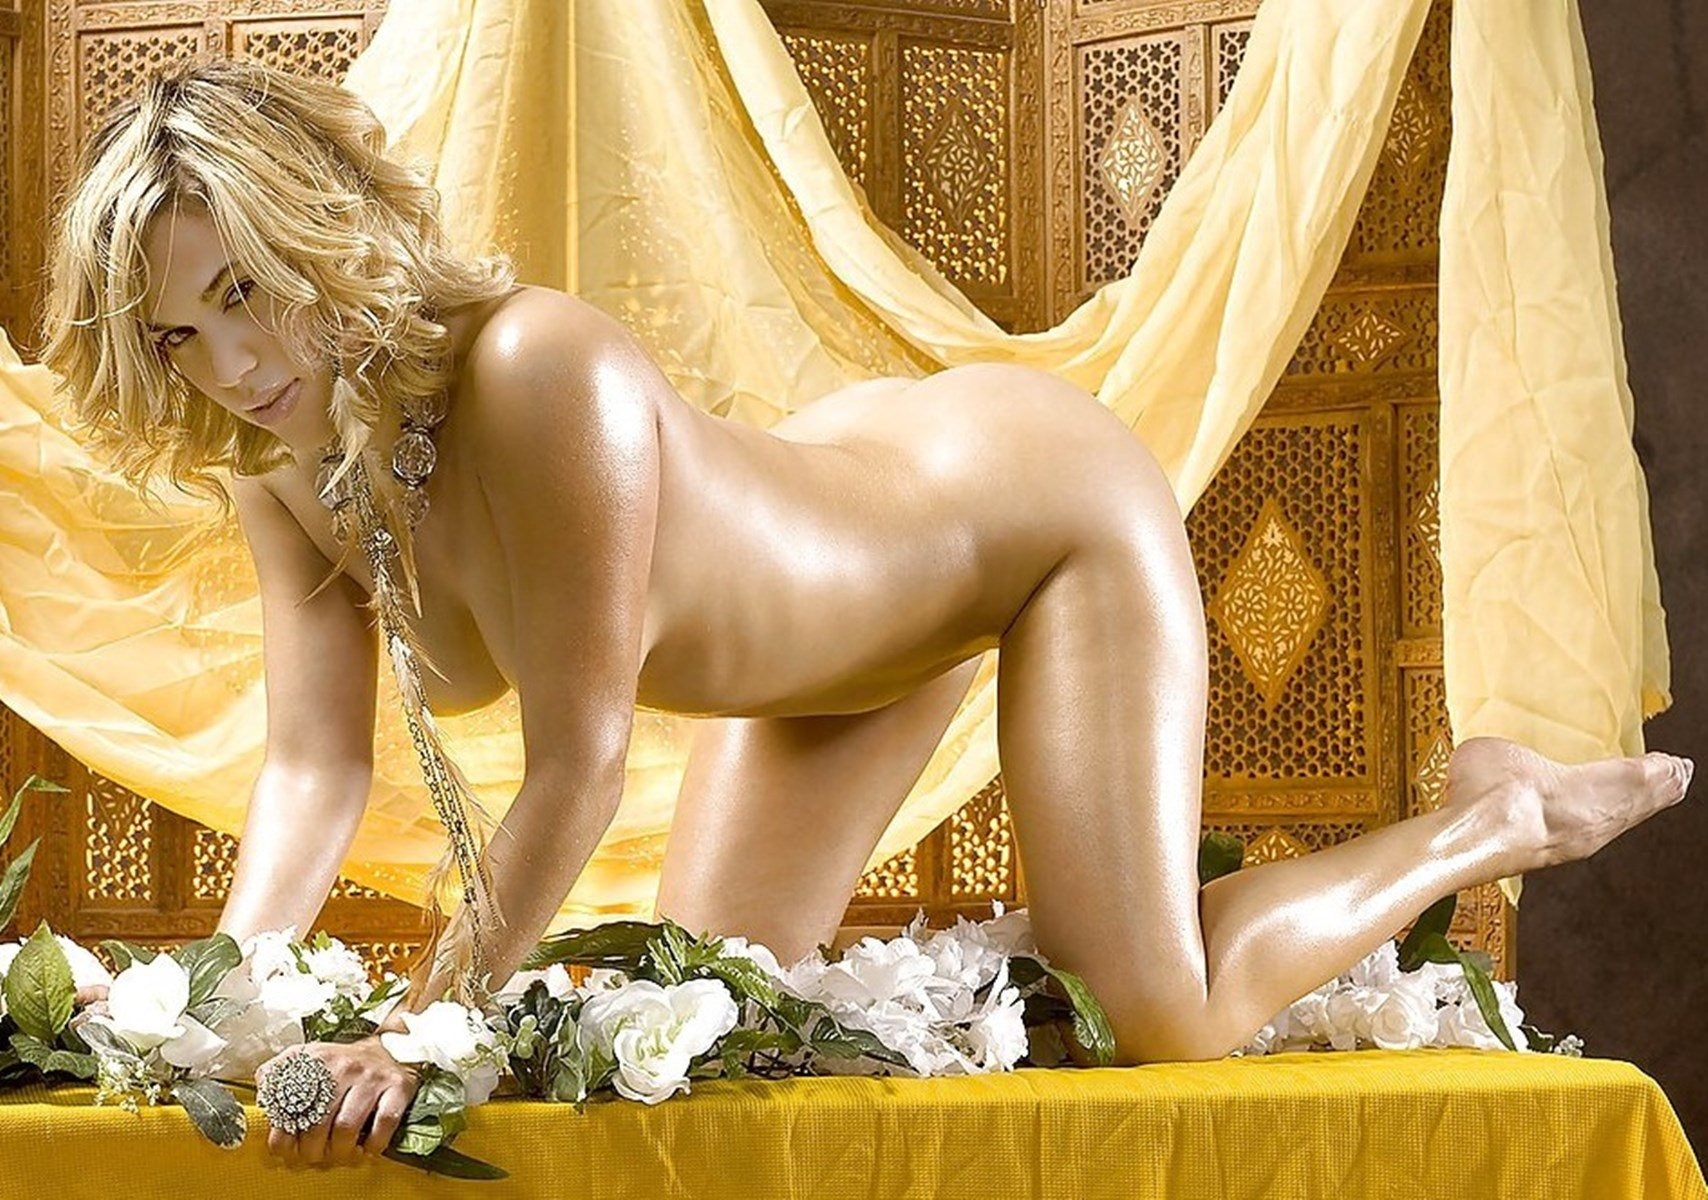 Wwe diva emma nude